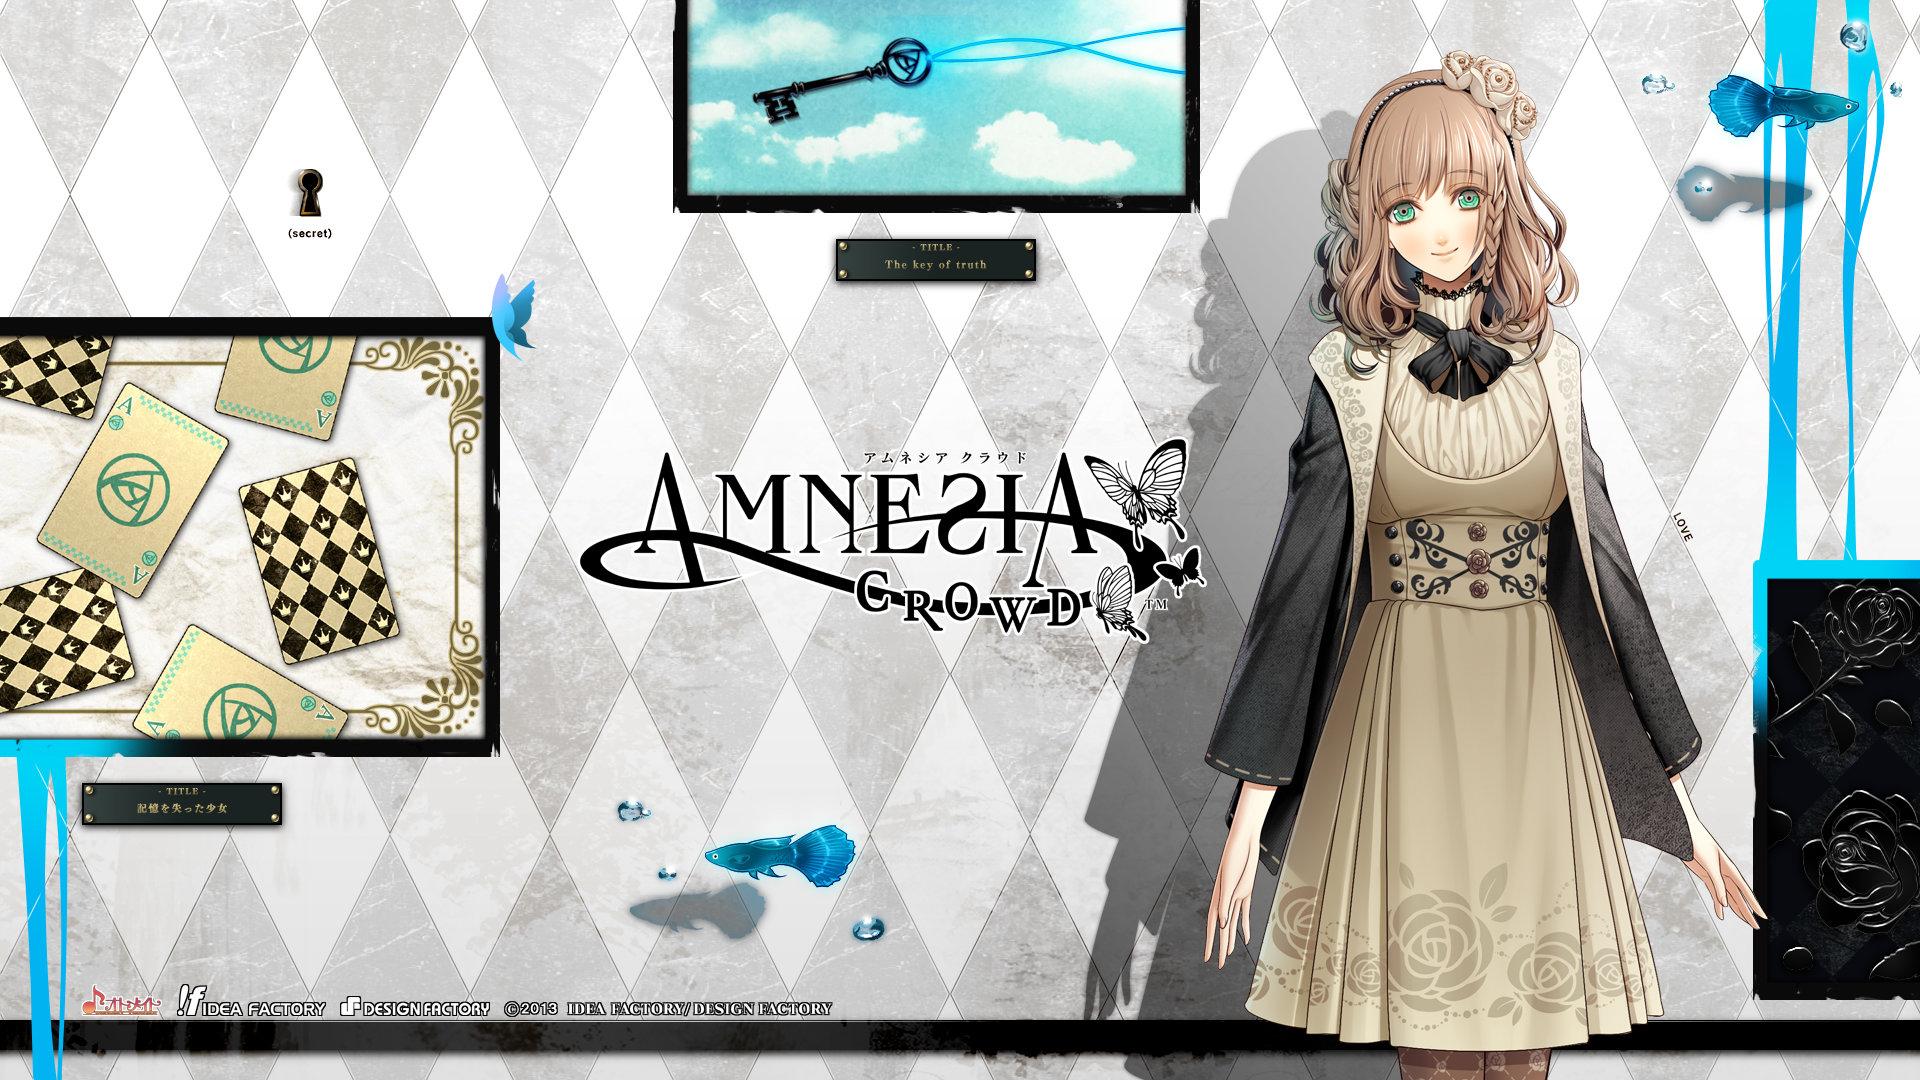 Free Amnesia High Quality Wallpaper Id Amnesia Anime Wallpaper Kent Hd Wallpaper Backgrounds Download